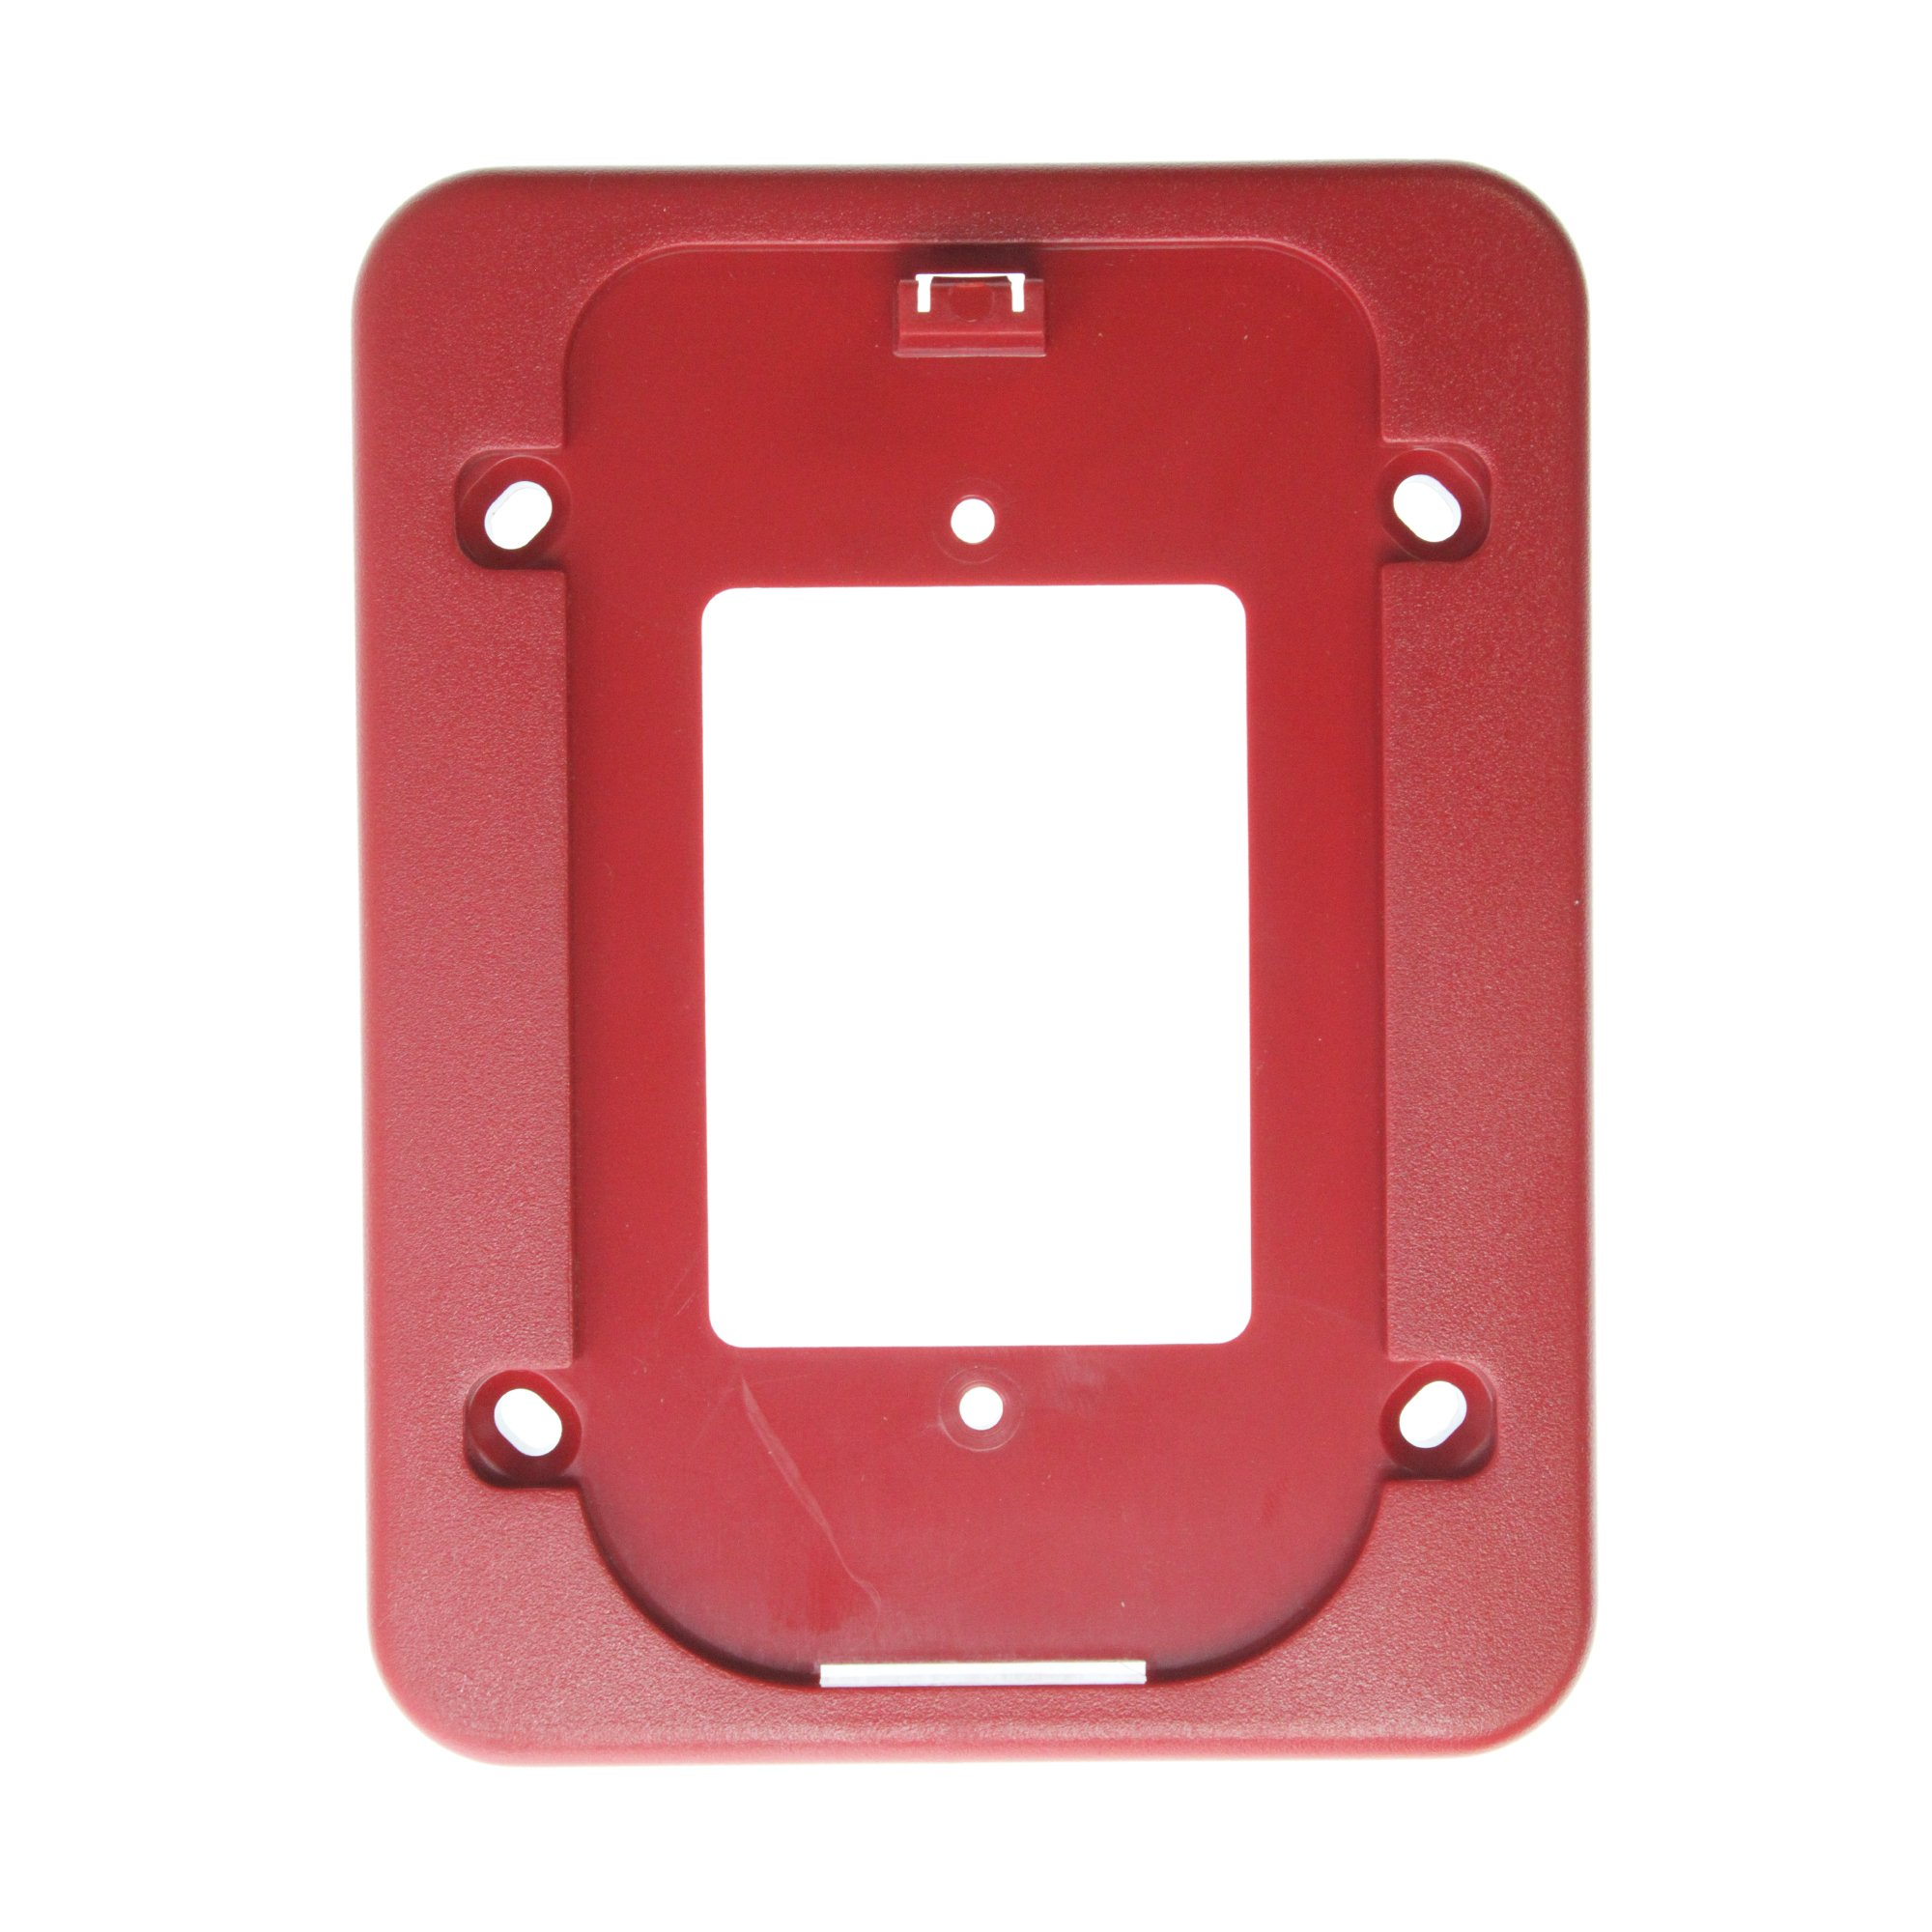 System Sensor BBS SpectrAlert Advance Alarm Wall Mount Back Box Skirt, Red by System Sensor (Image #1)